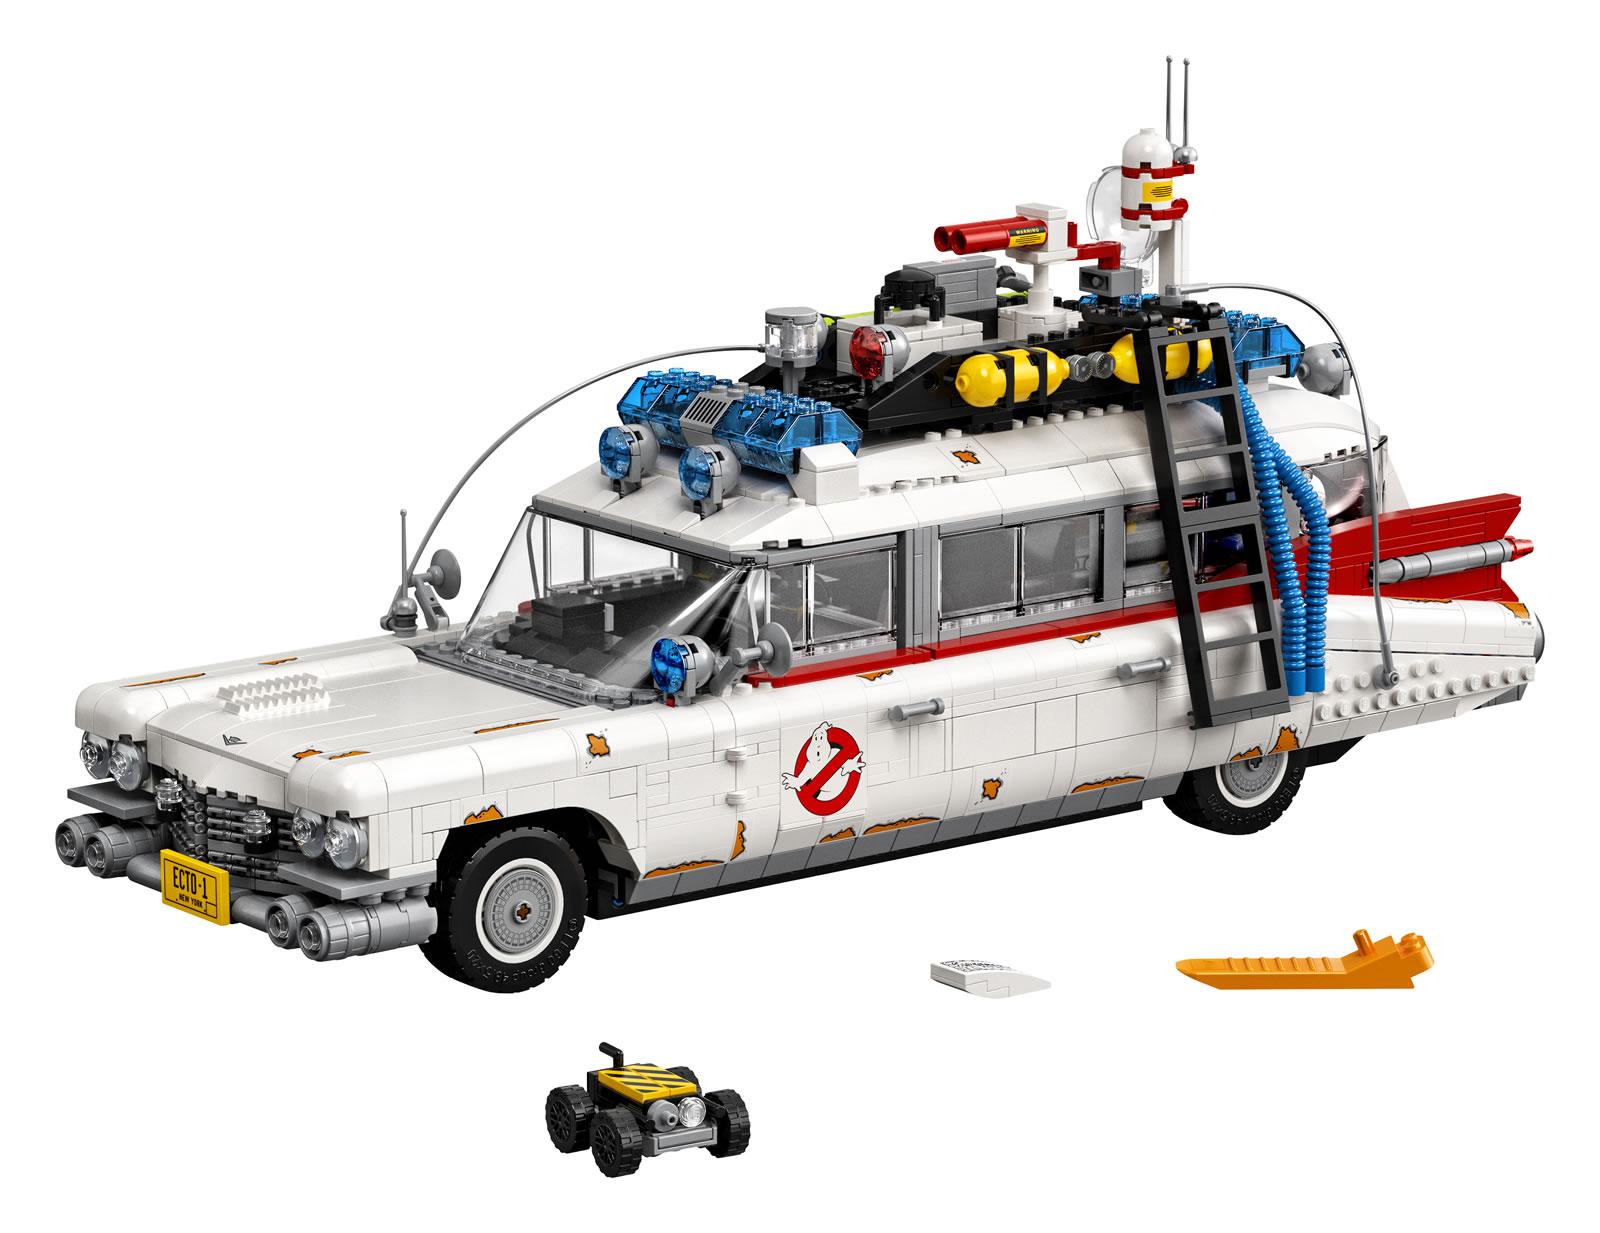 LEGO : Ze topik =) - Page 3 Lego-ghostbusters-ecto-1-10274_1